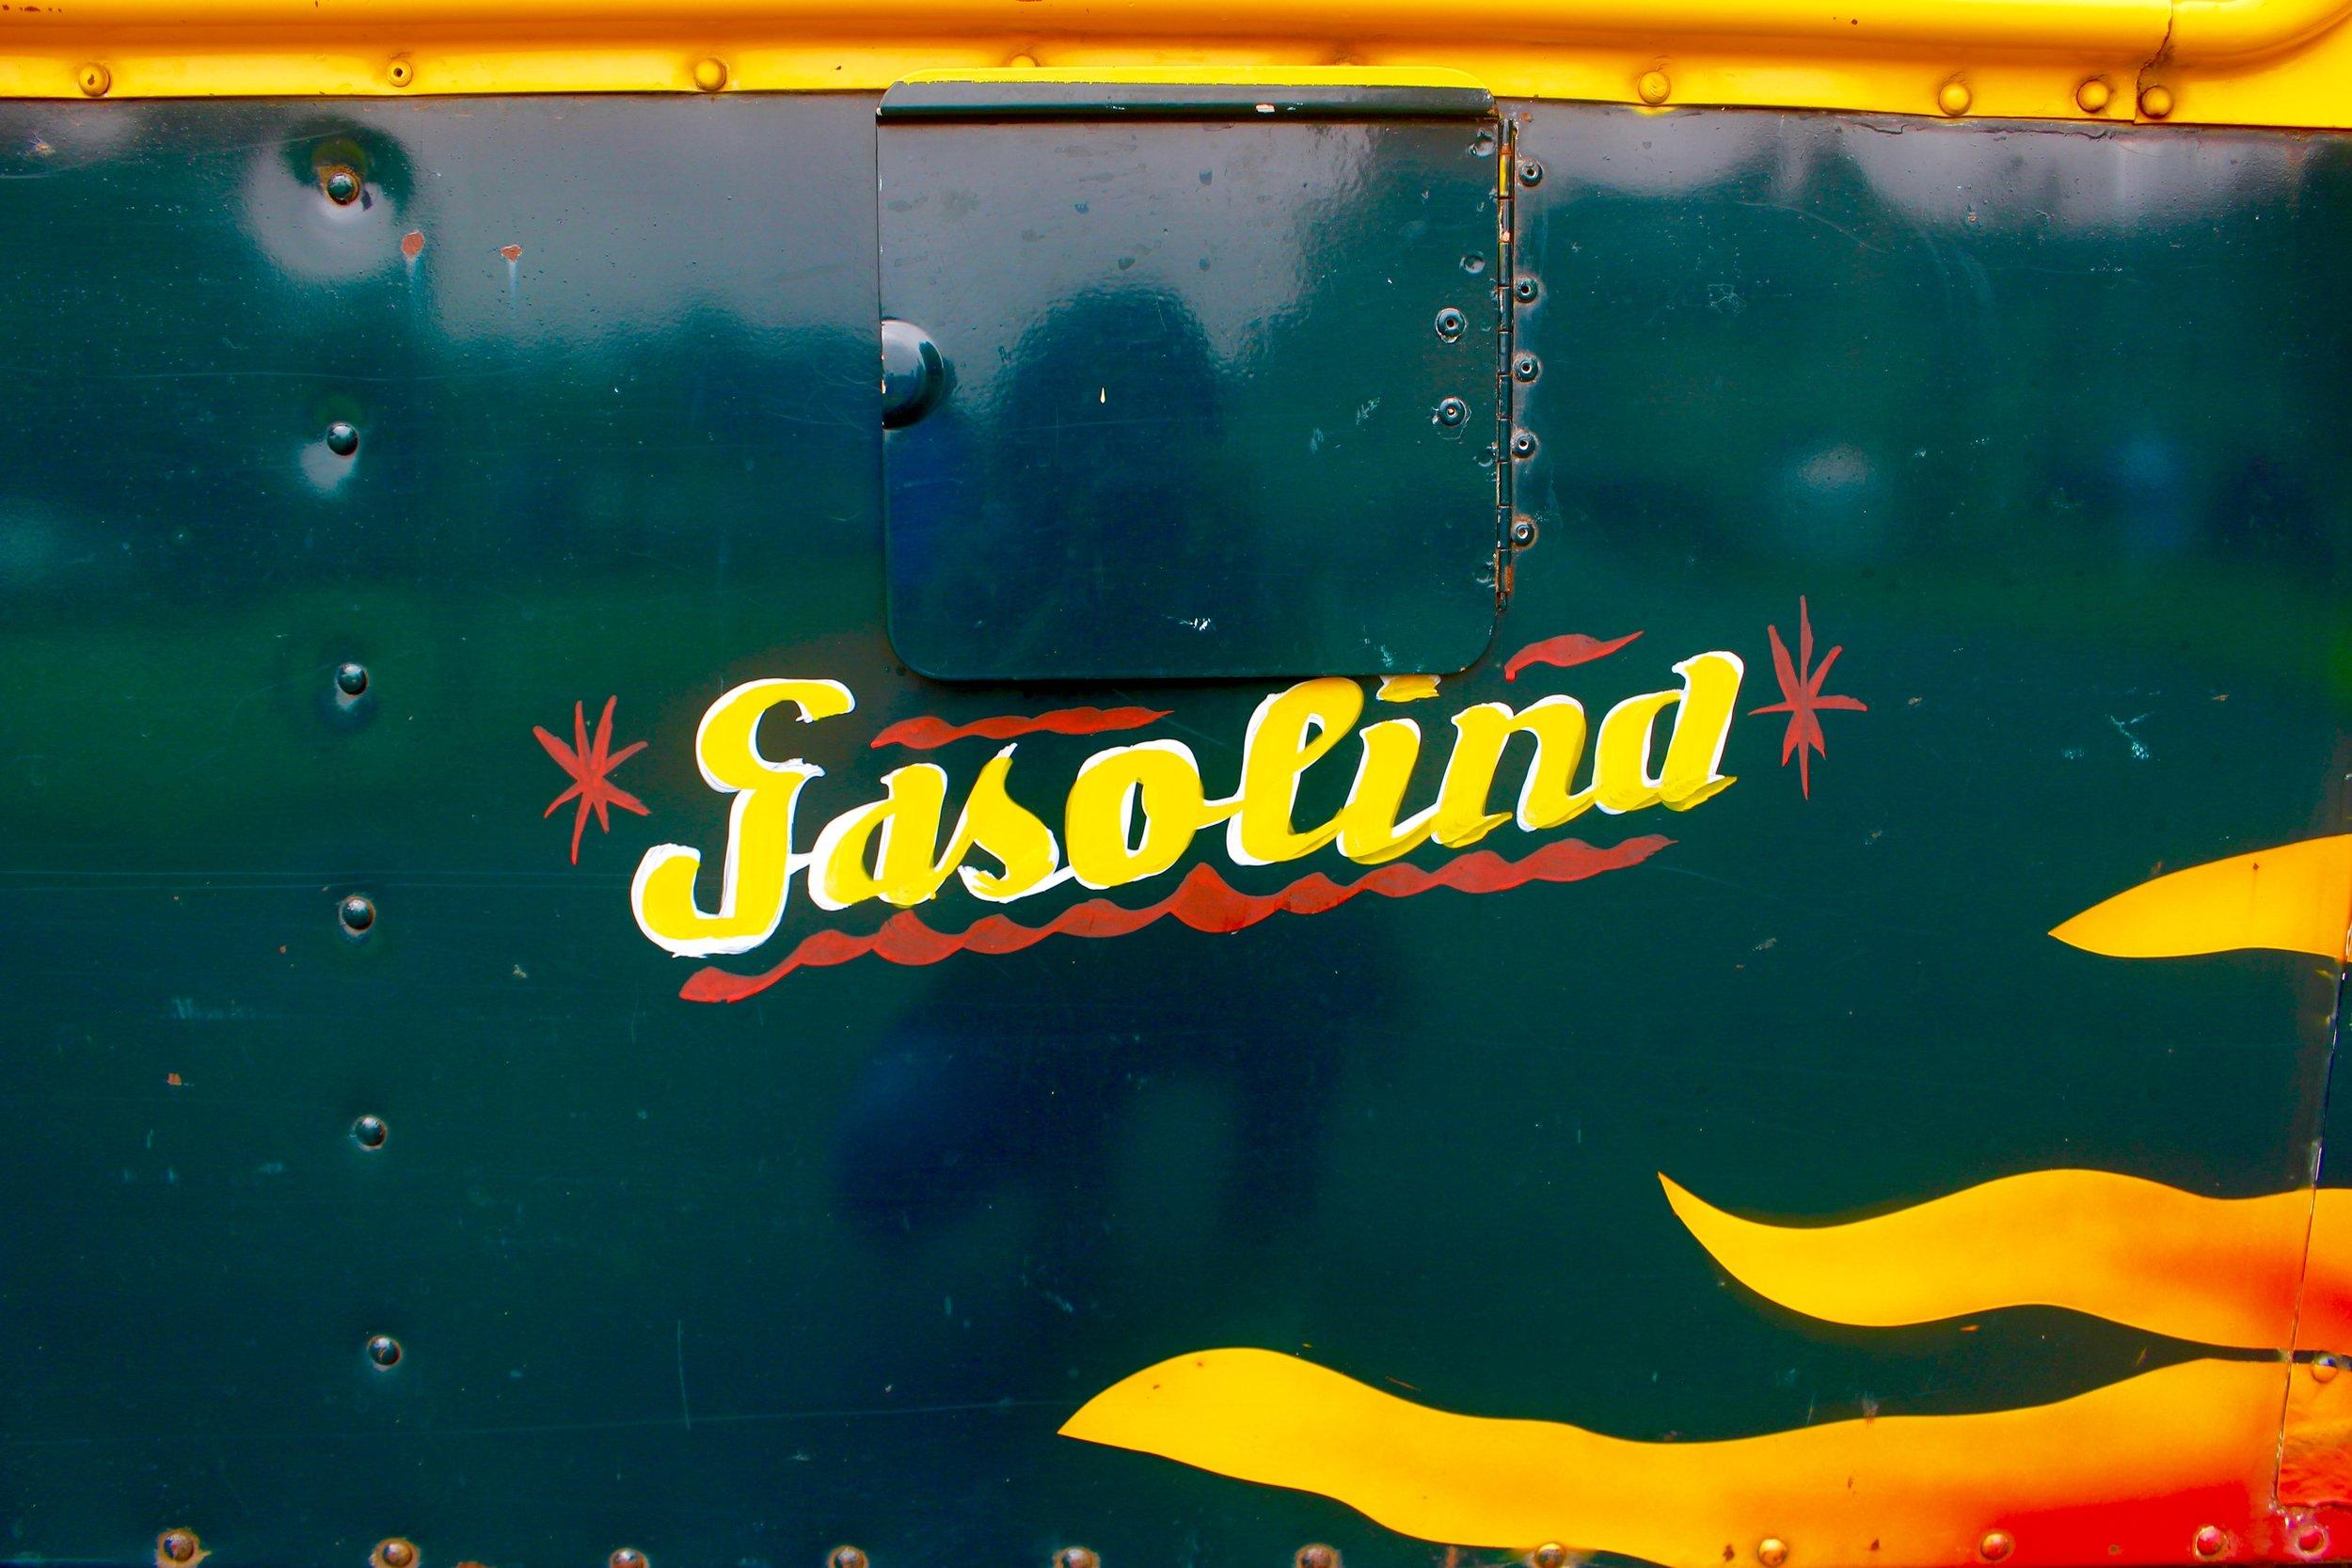 Gasolina_Guicha.jpg